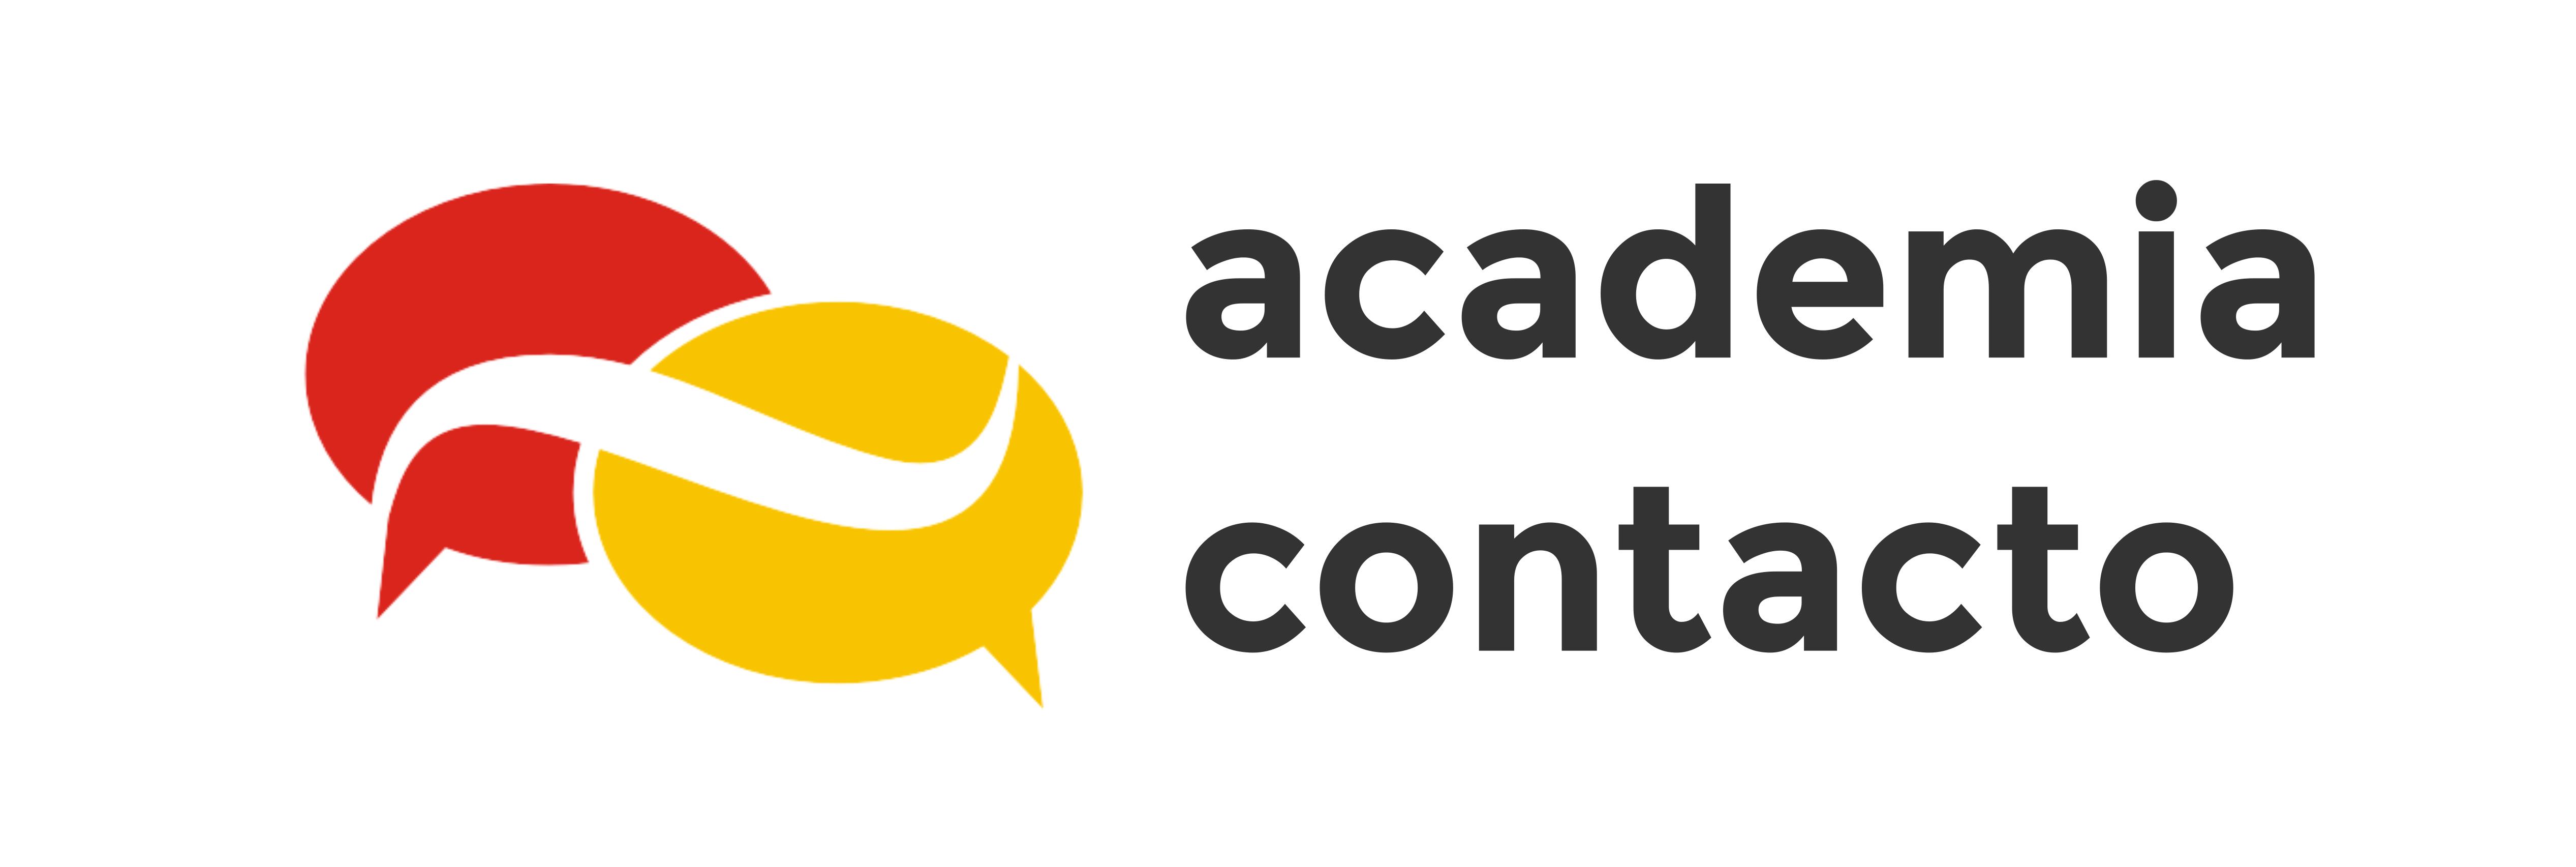 Academia Contacto Madrid Spanien Bildungsurlaub Approval